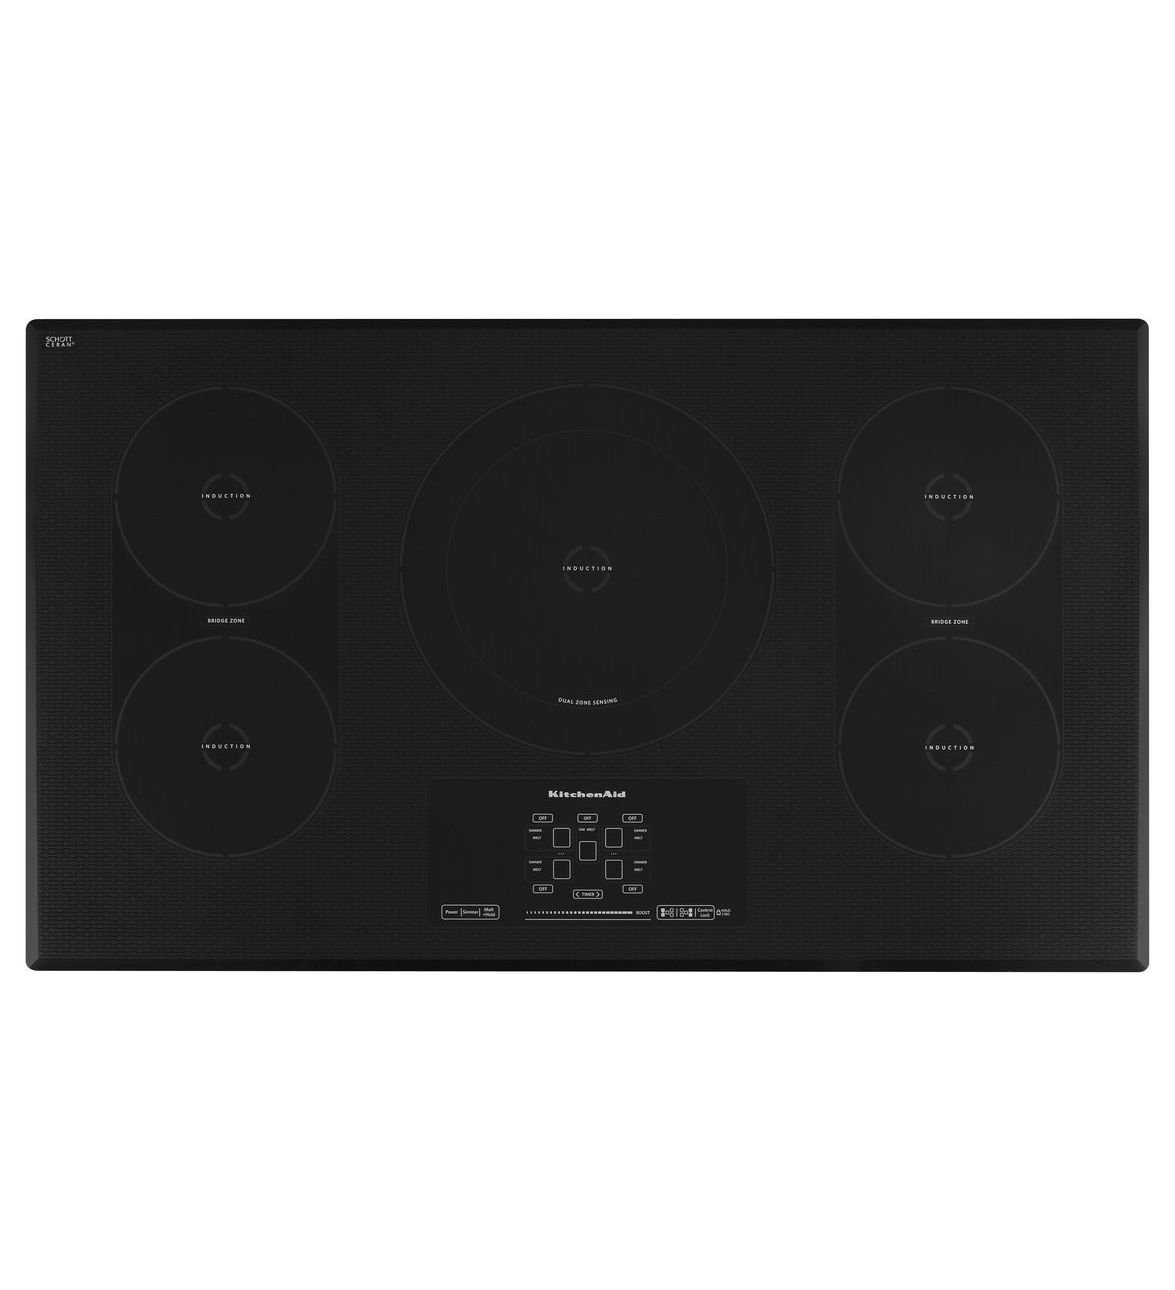 Kitchenaid KICU569XBL 36-Inch, 5-Element Induction Cooktop